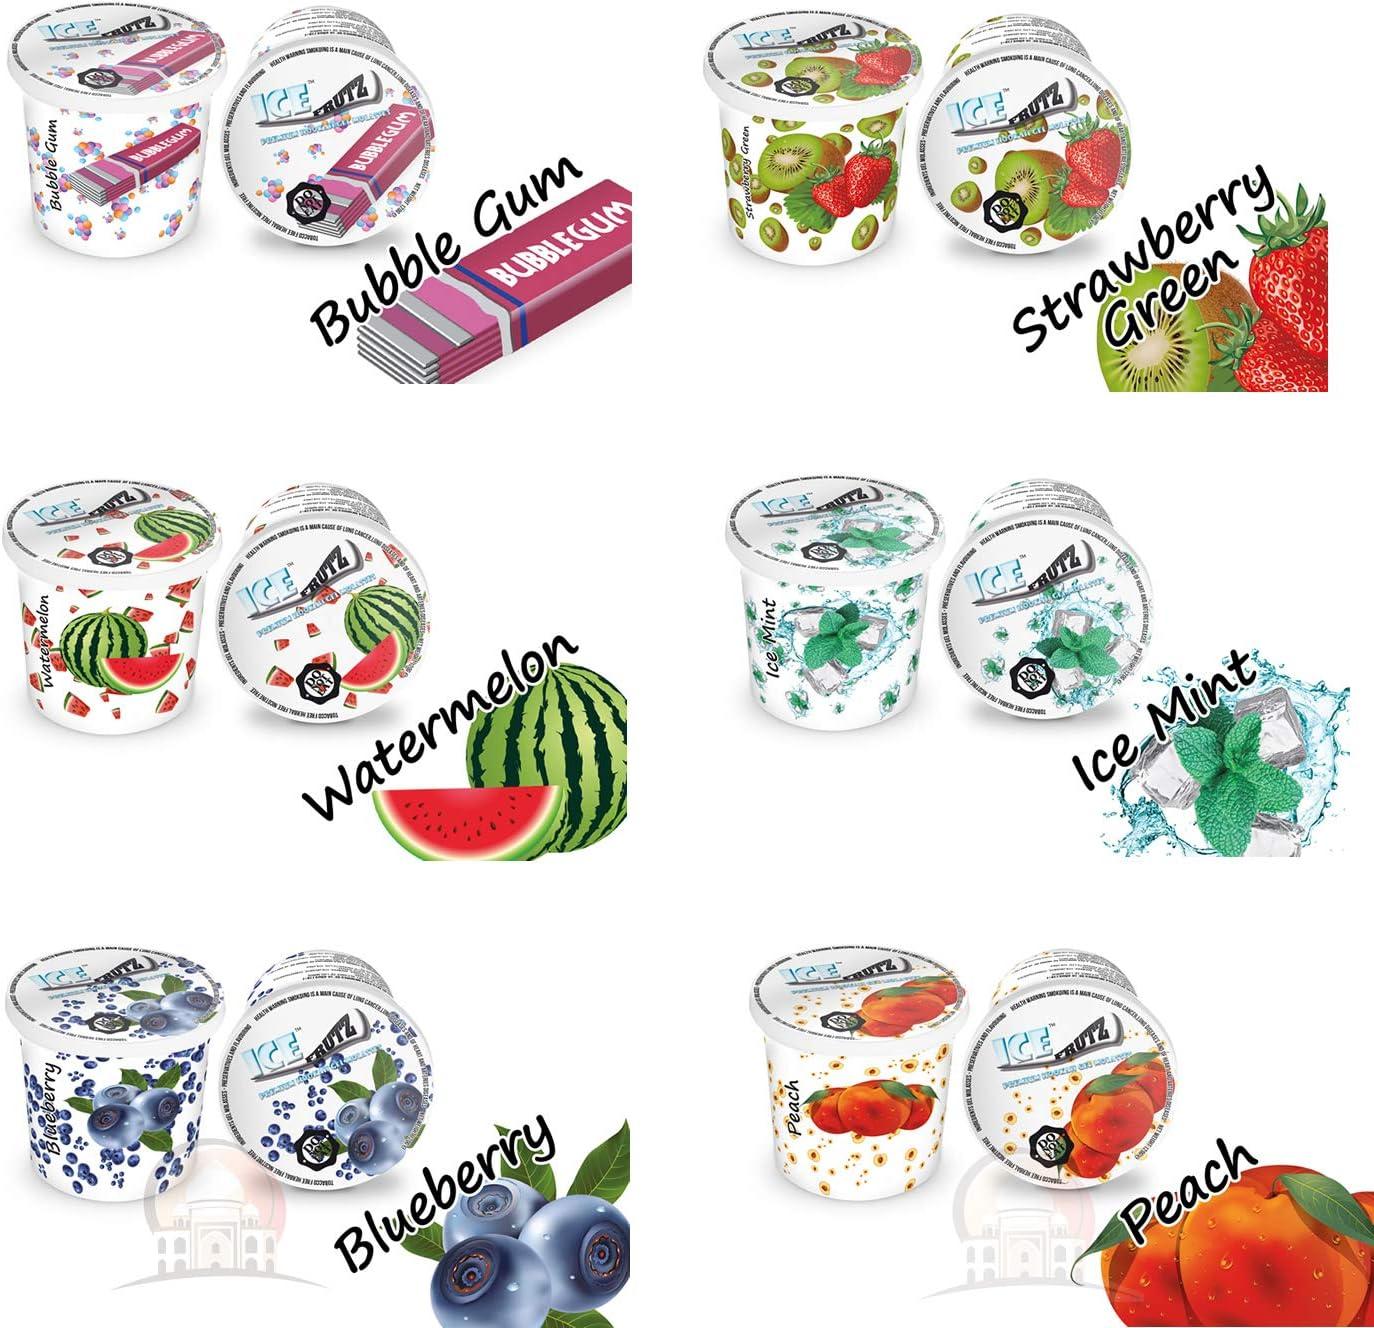 Ice Frutz Gel Gel de Vapor Shisha Gel Mixed Pack, 6 tipos de pipa de agua Gel Granulado Nikotinfreier Tabakersatz